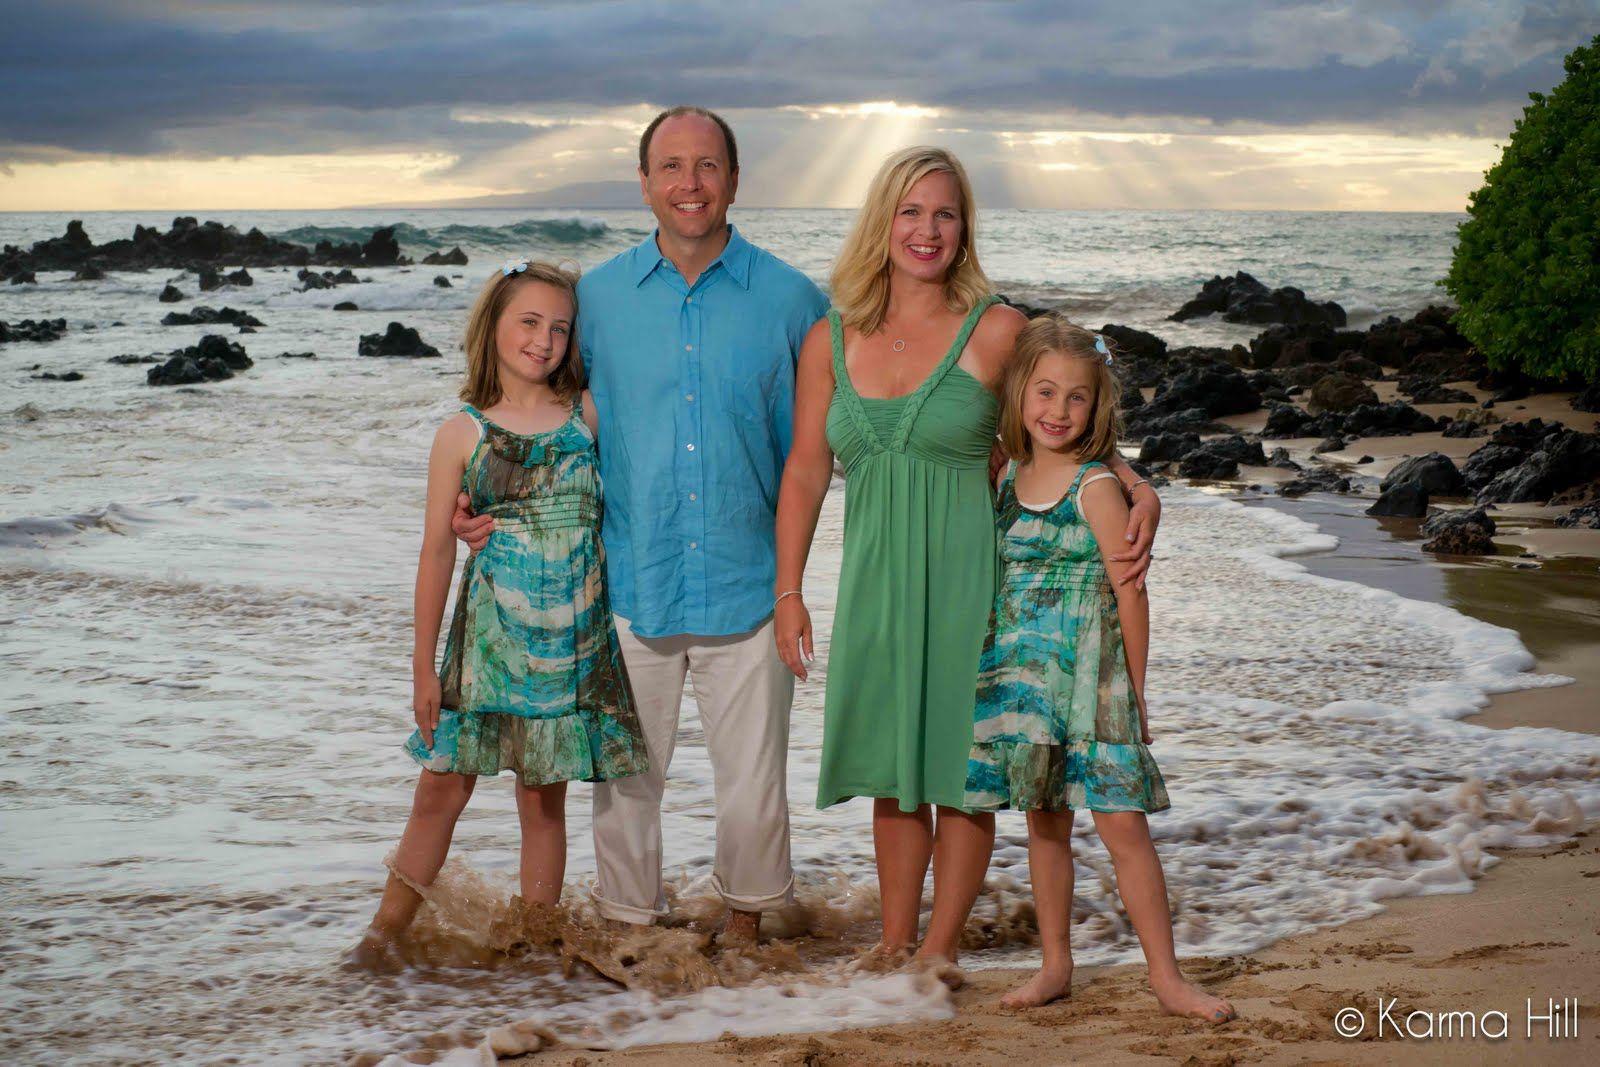 Family Beach Photos Maui Photographers By Maui Vacation Portraits What To Wear